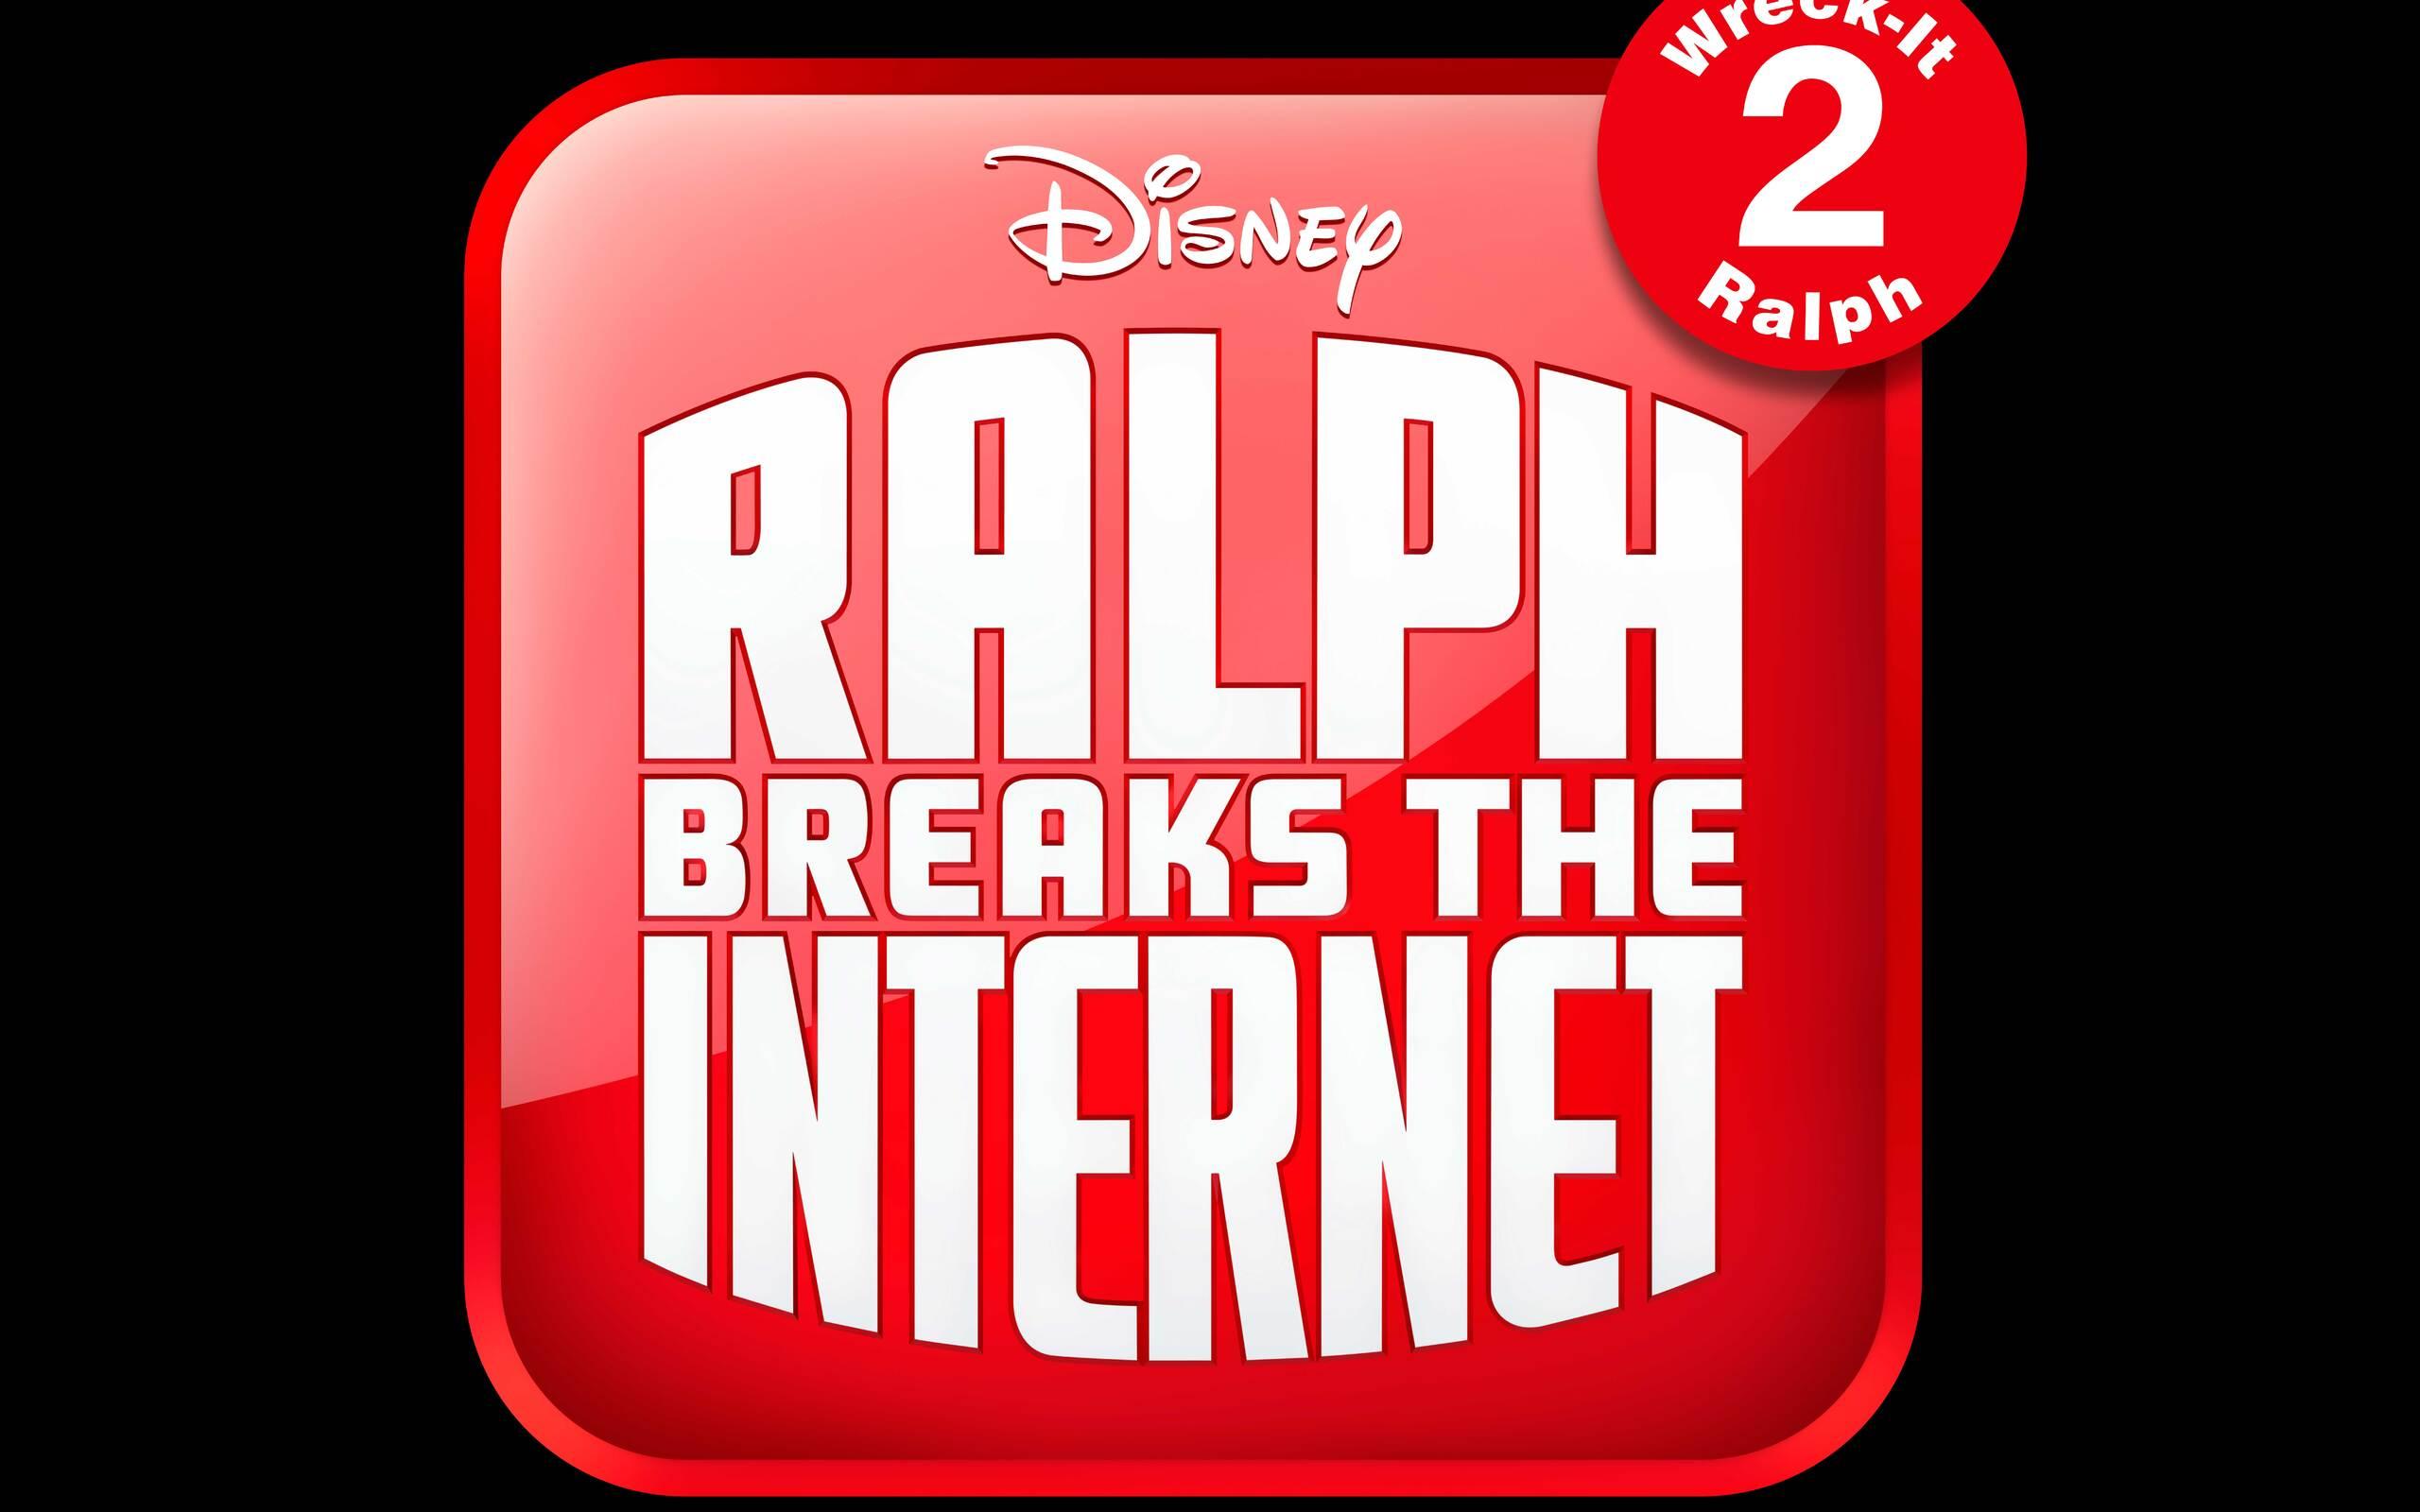 ralph-breaks-the-internet-wreck-it-ralph-2-12k-logo-wh.jpg